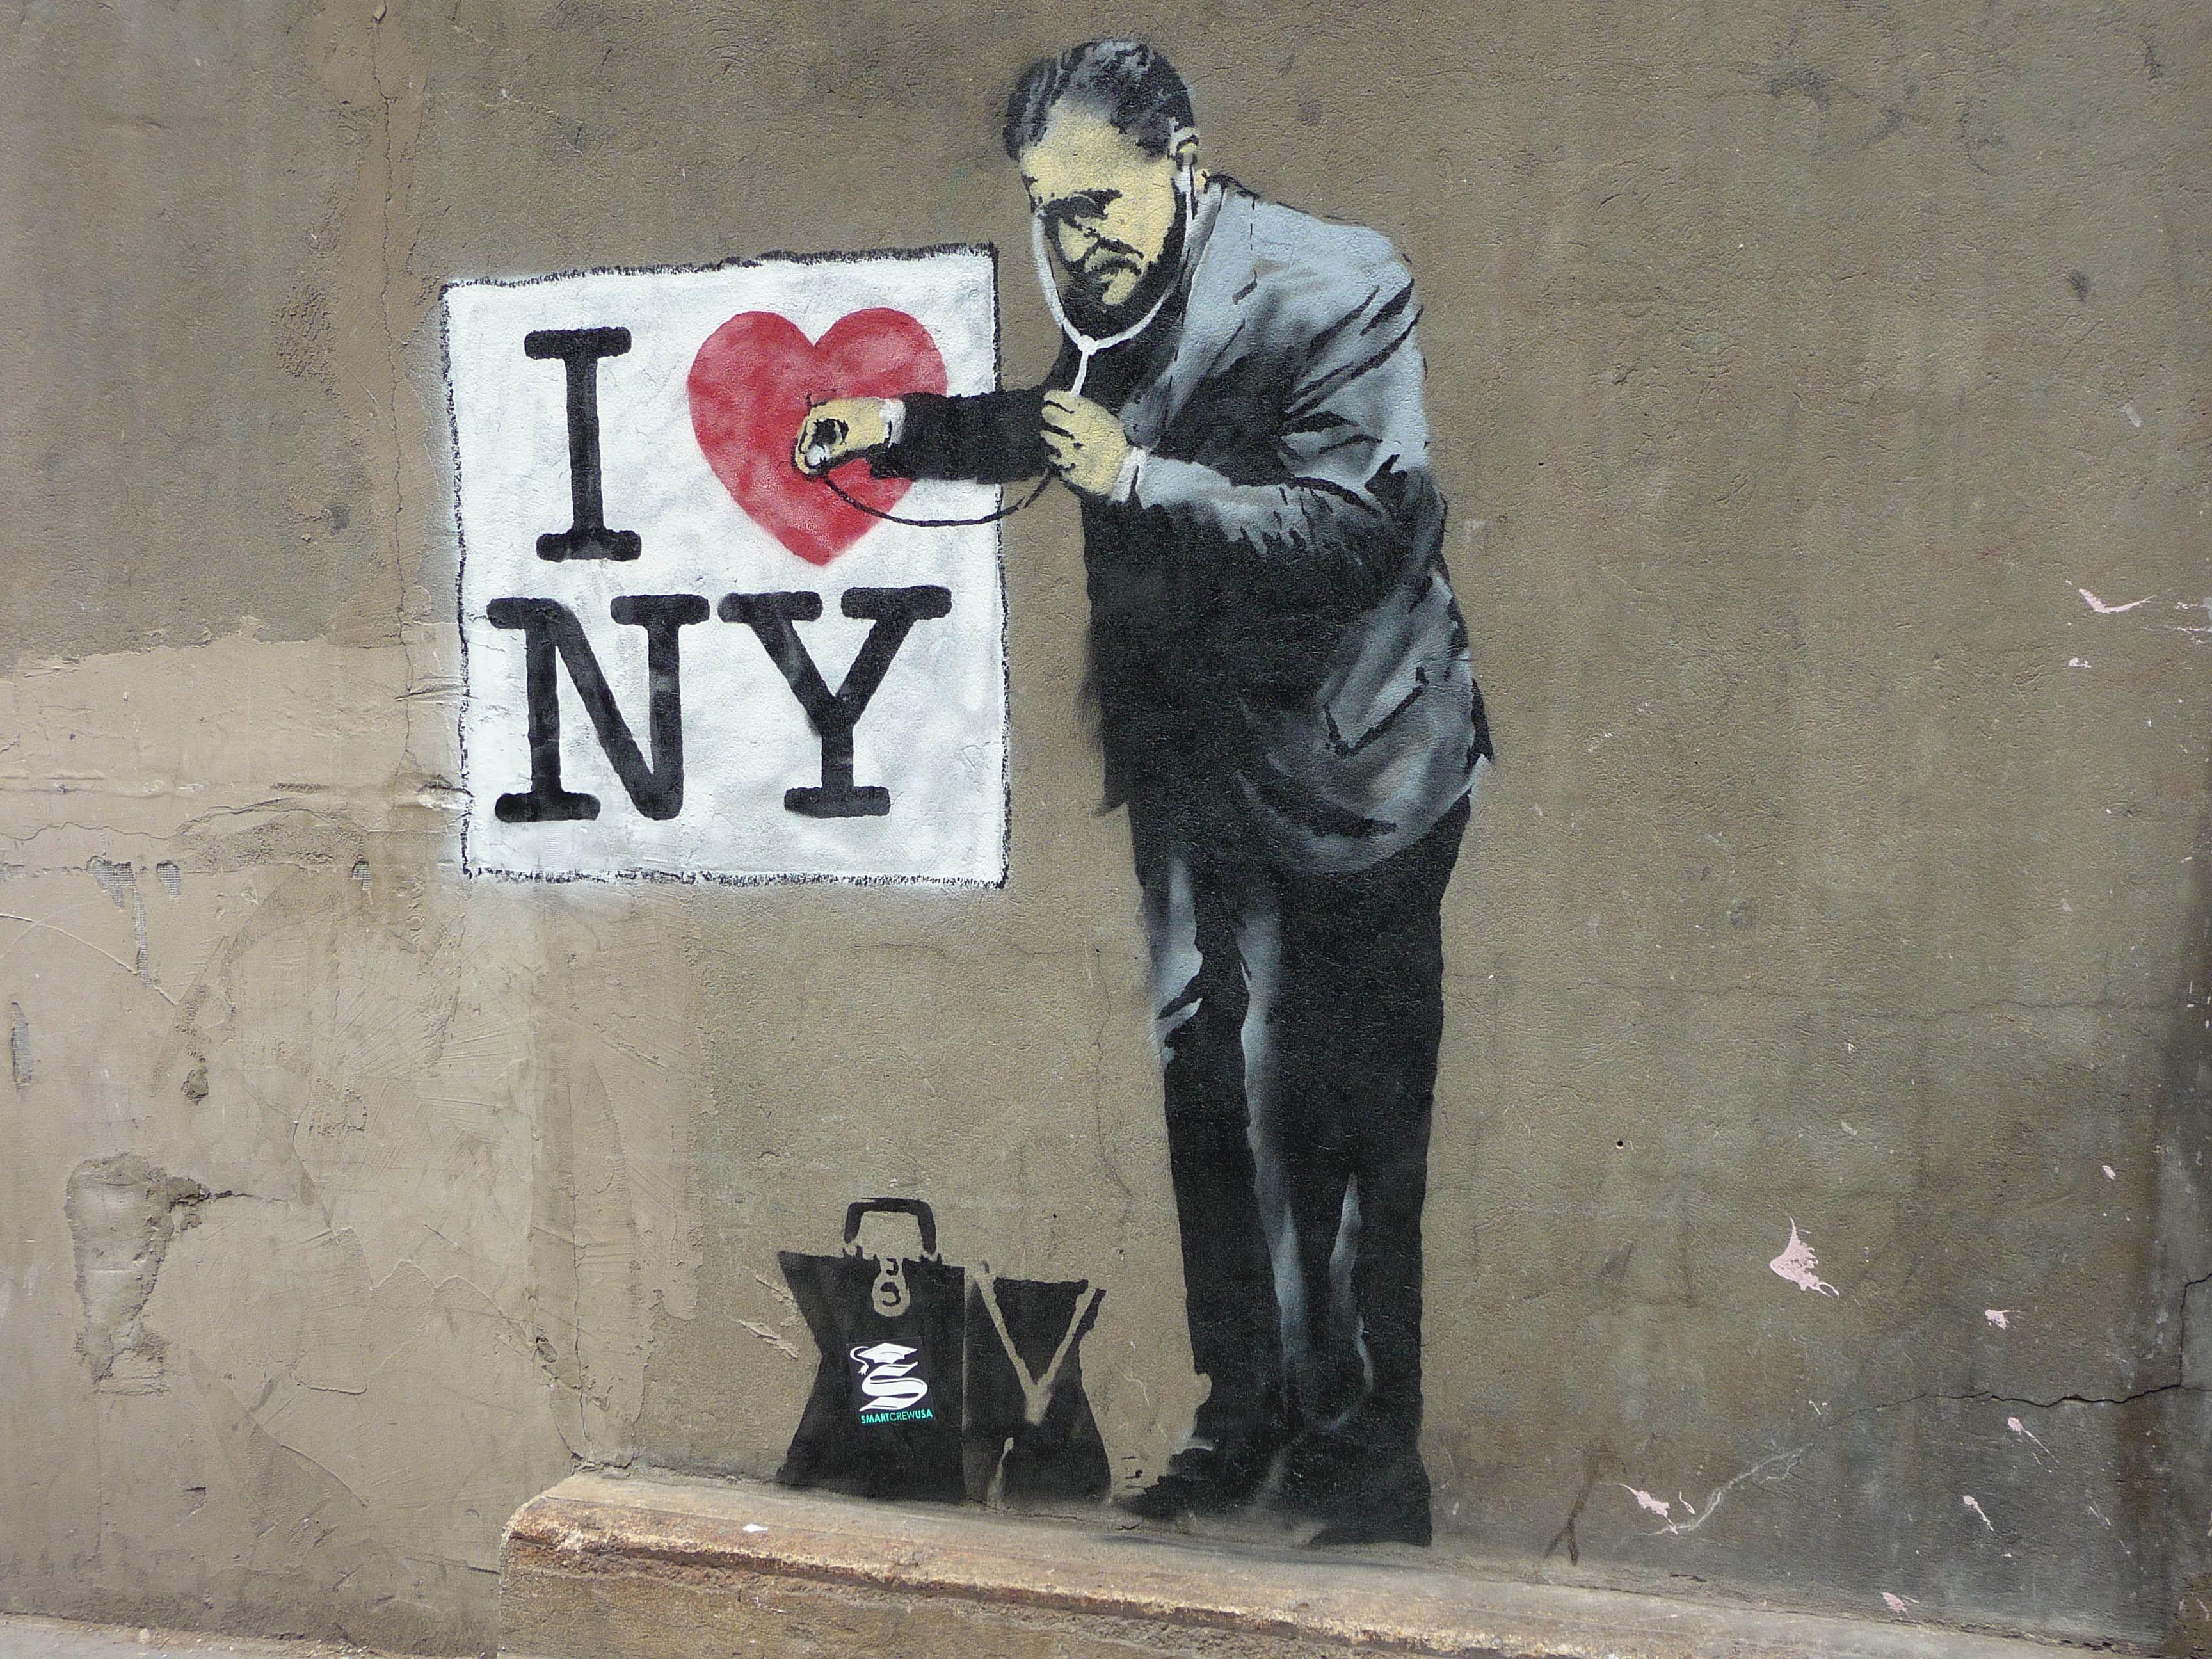 Banksy Visits New York Arte urbano banksy, Banksy